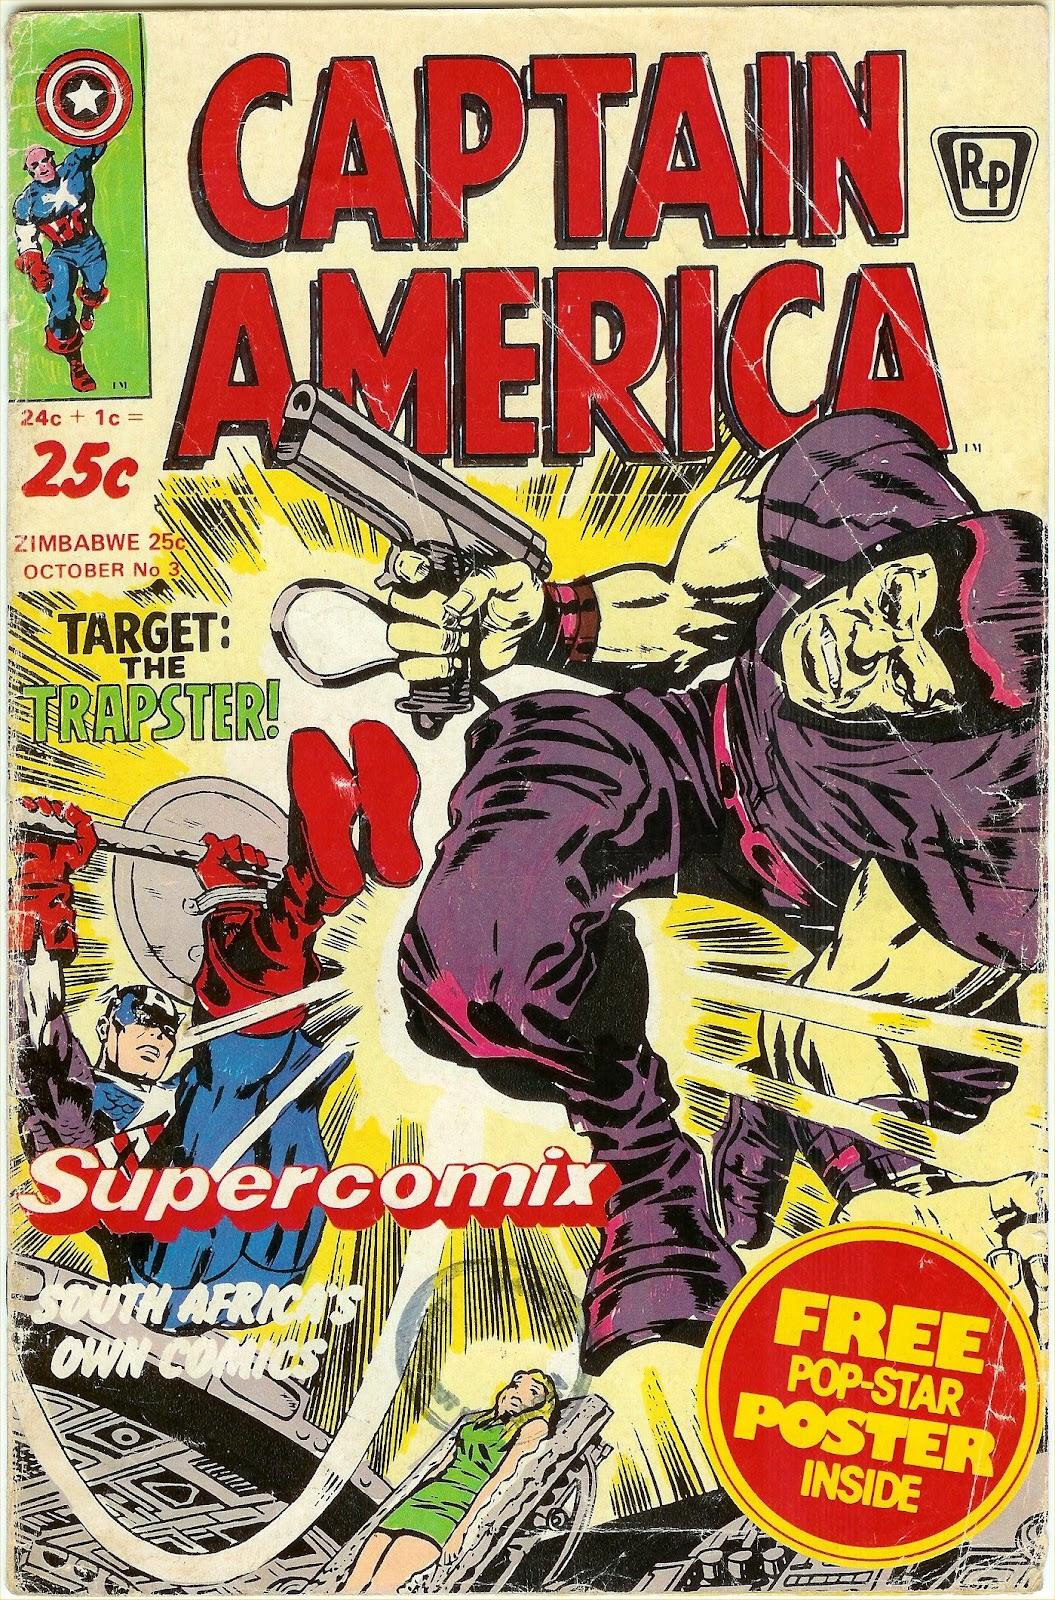 south african comic books supercomix captain america 3. Black Bedroom Furniture Sets. Home Design Ideas